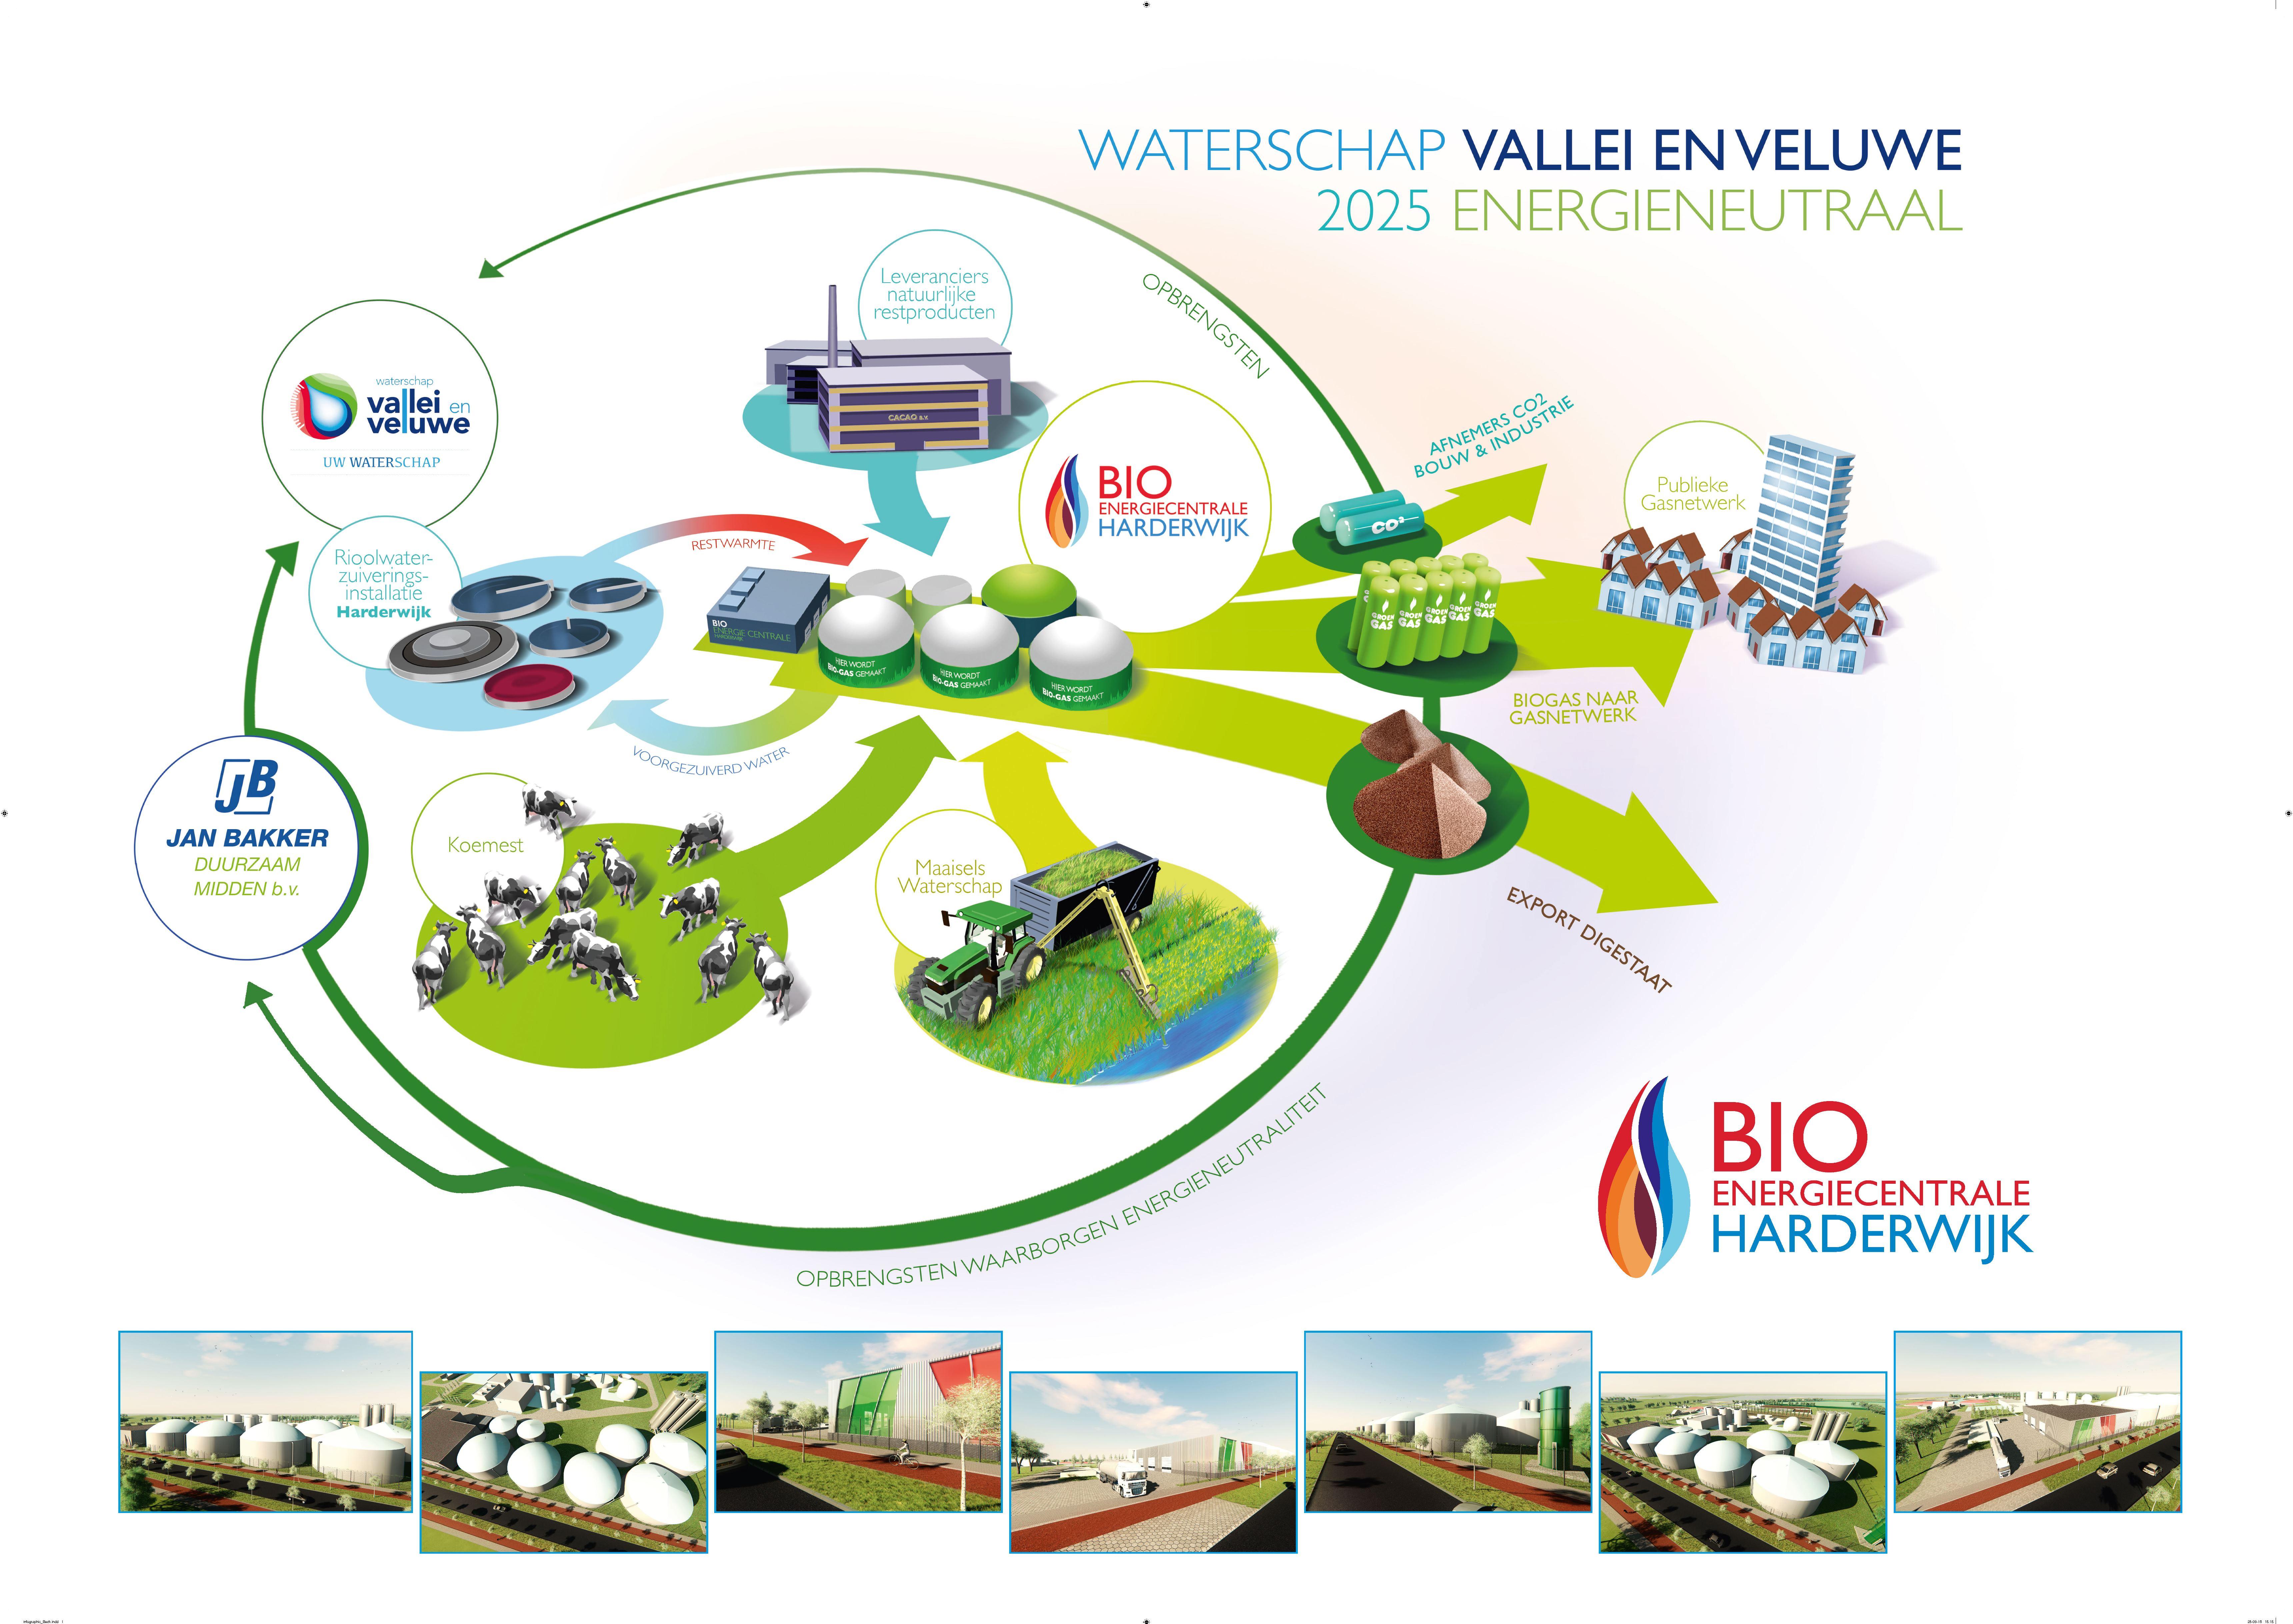 Construction Of Bioenergy Plant In Harderwijk Is Unique Biogas Diagram Infographic By Waterschap Vallei Veluwe